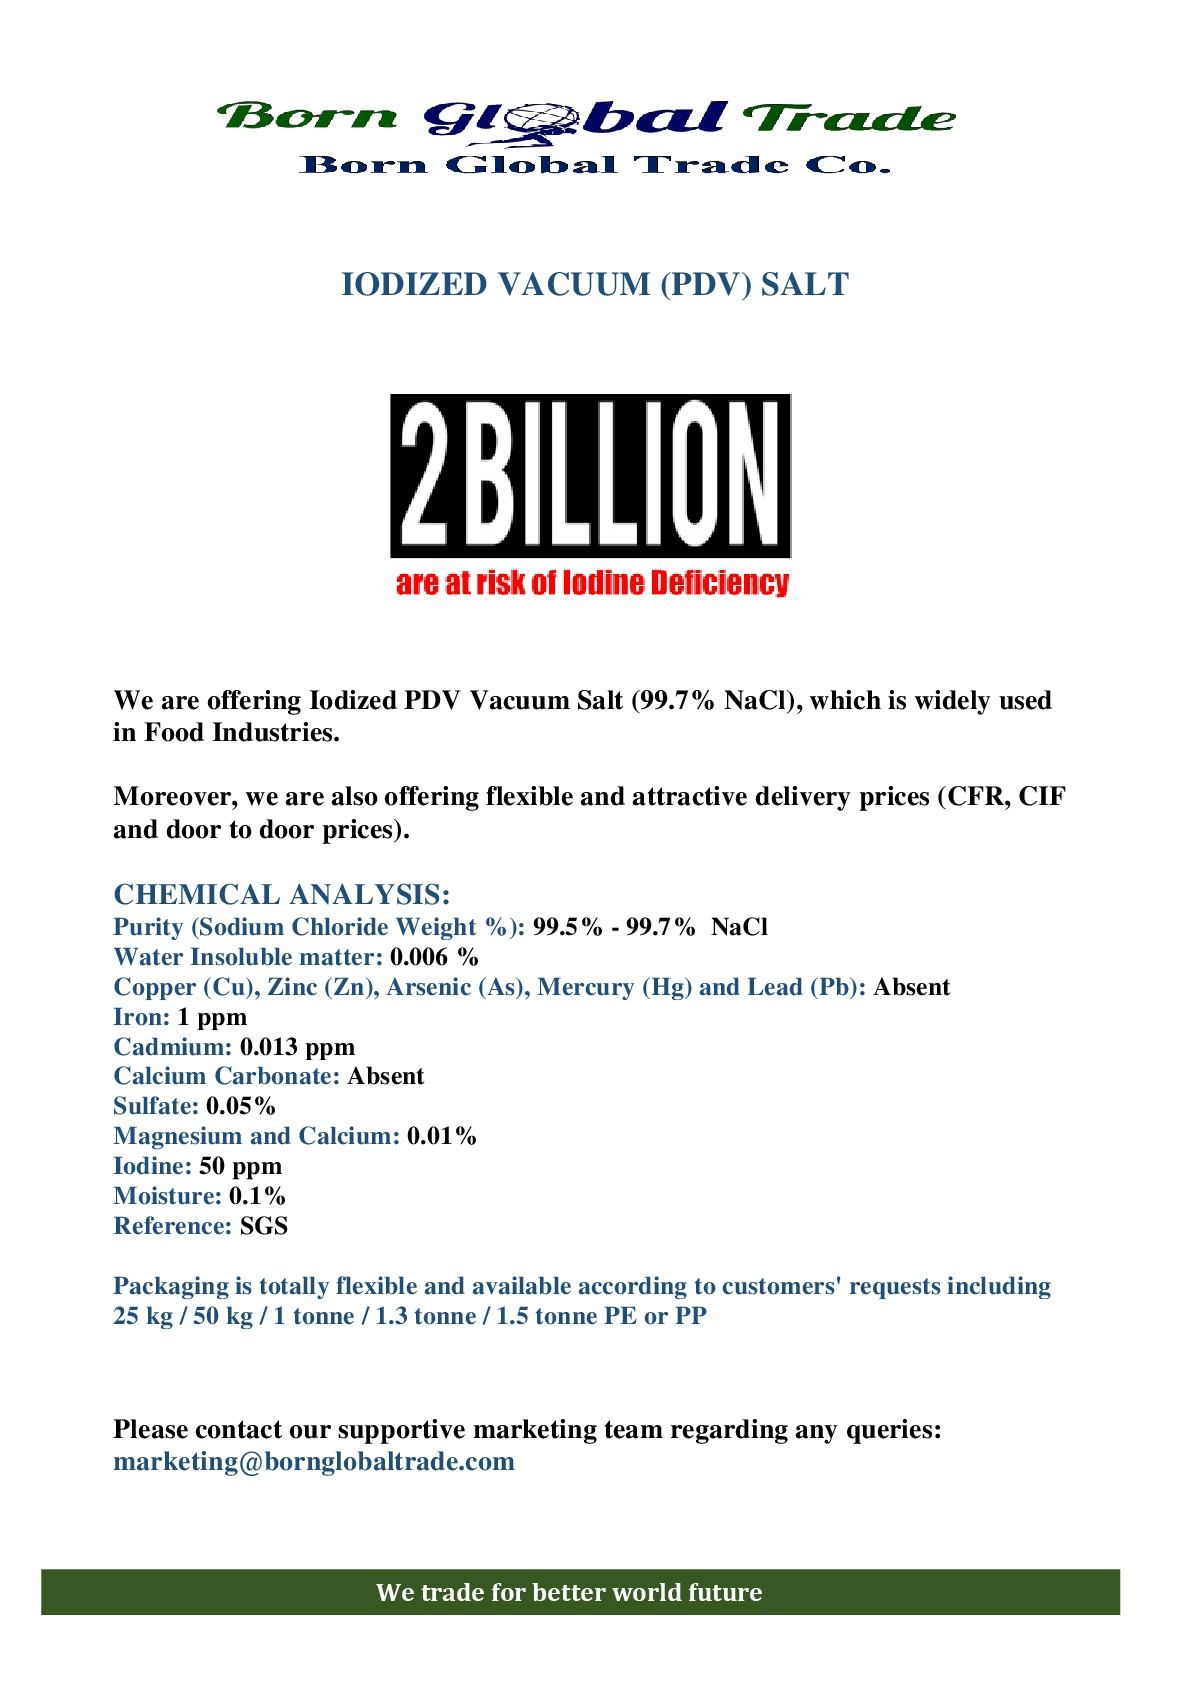 Iodized PDV Vacuum Salt